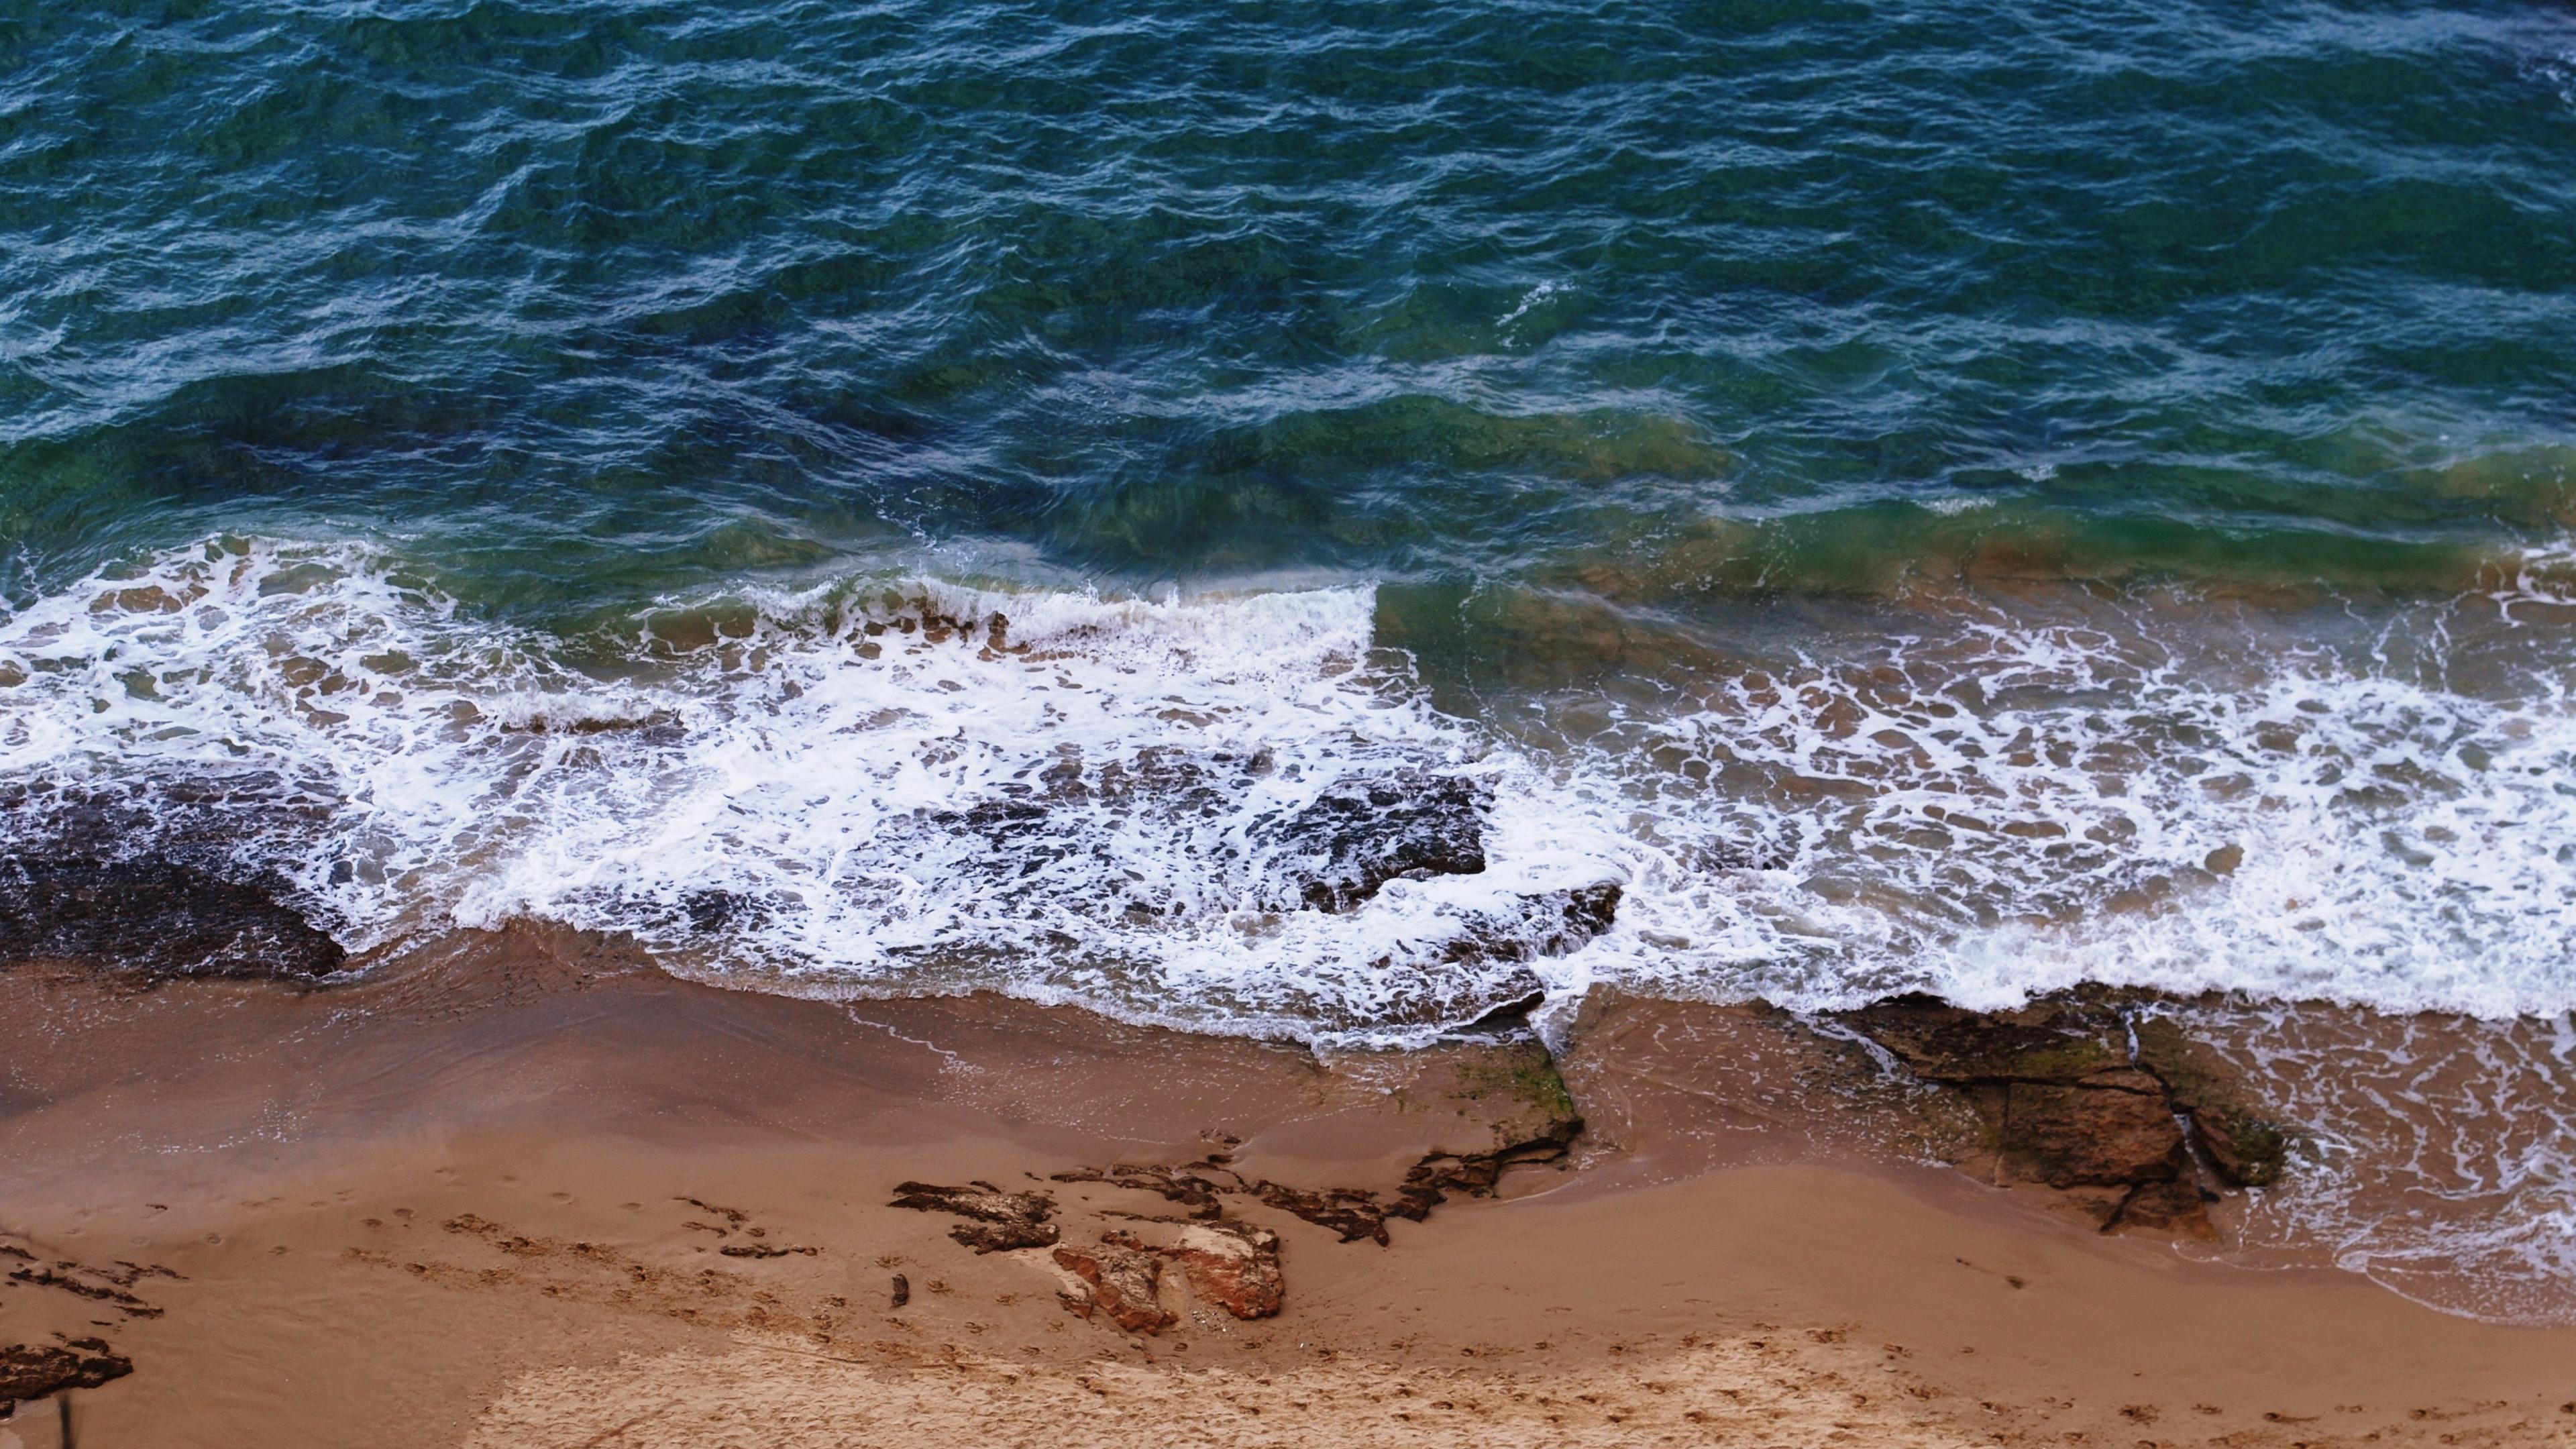 sea beach footprints 4k 1541114421 - sea, beach, footprints 4k - Sea, footprints, Beach